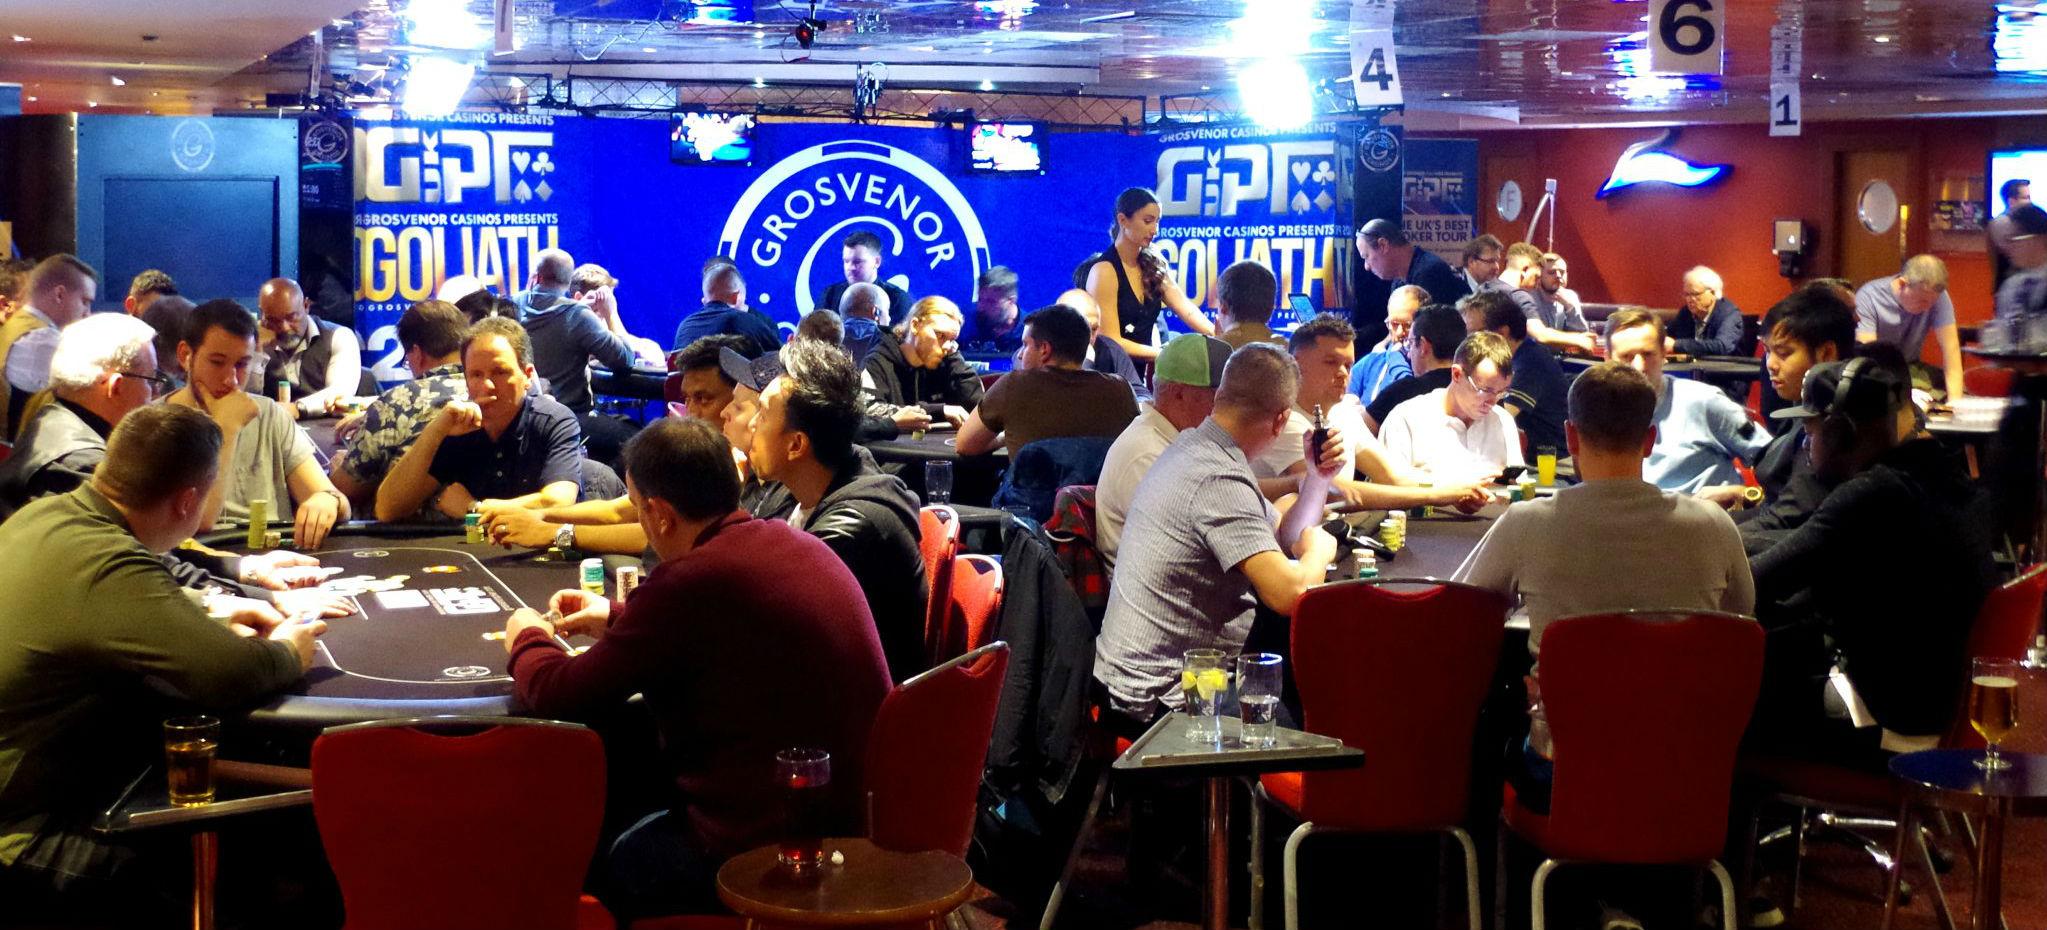 Blackpool g casino football betting world cup 2021 top scorer betting trends